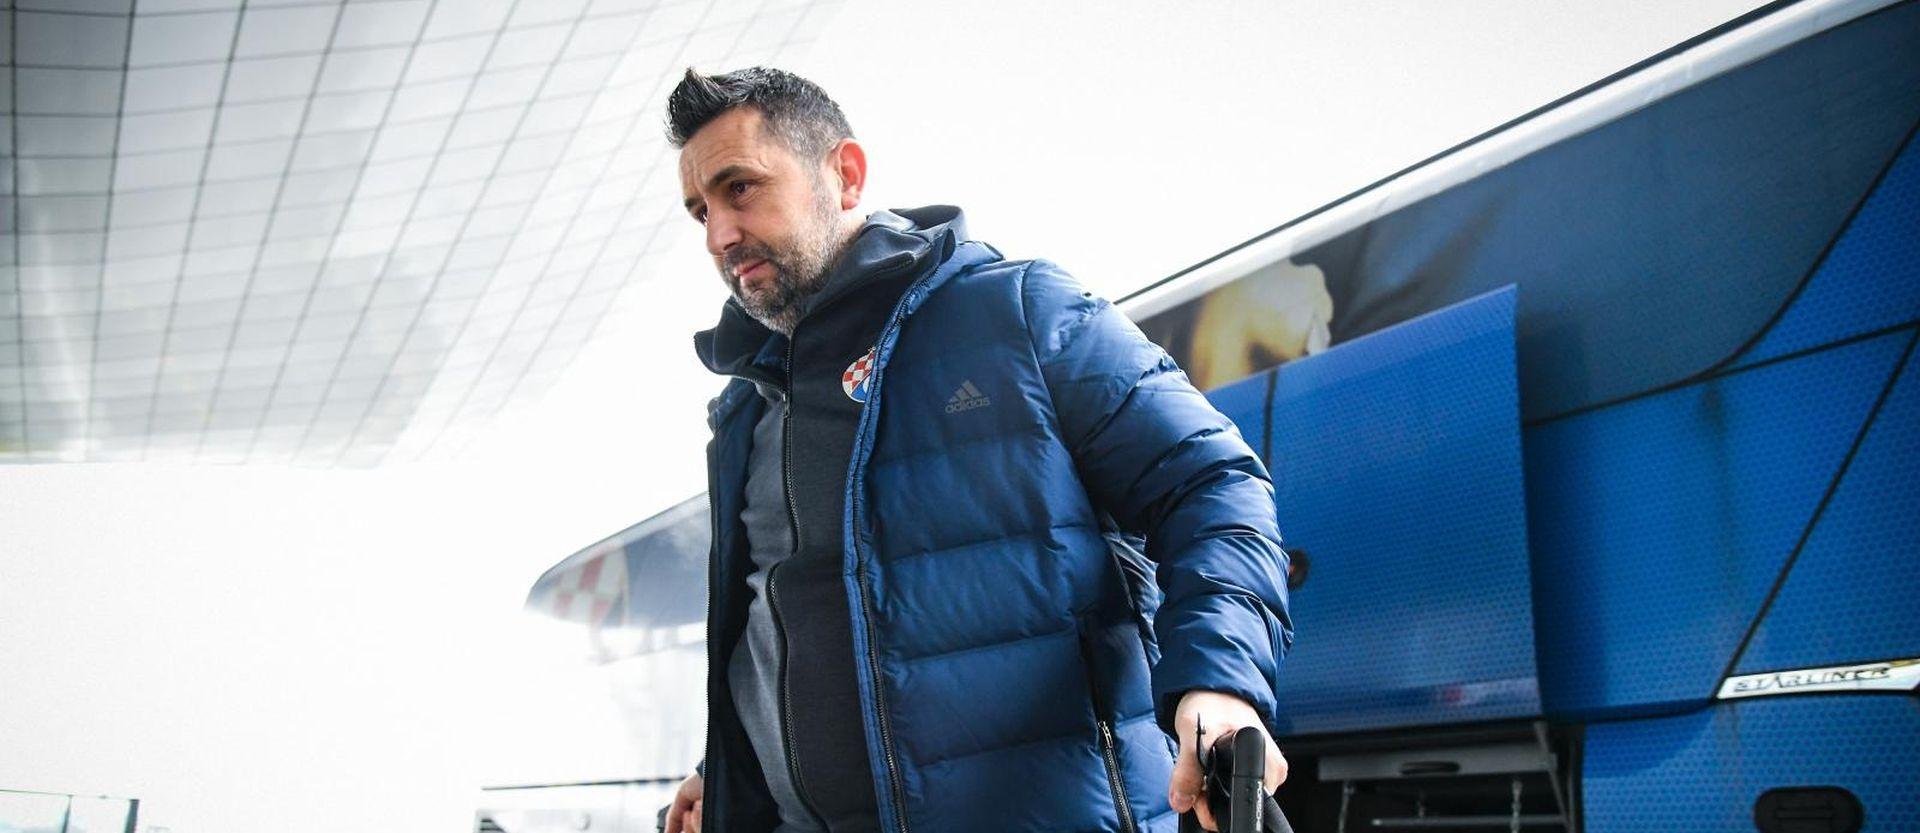 Mario Budimir iz Dinama preselio kod Ivankovića u Iran